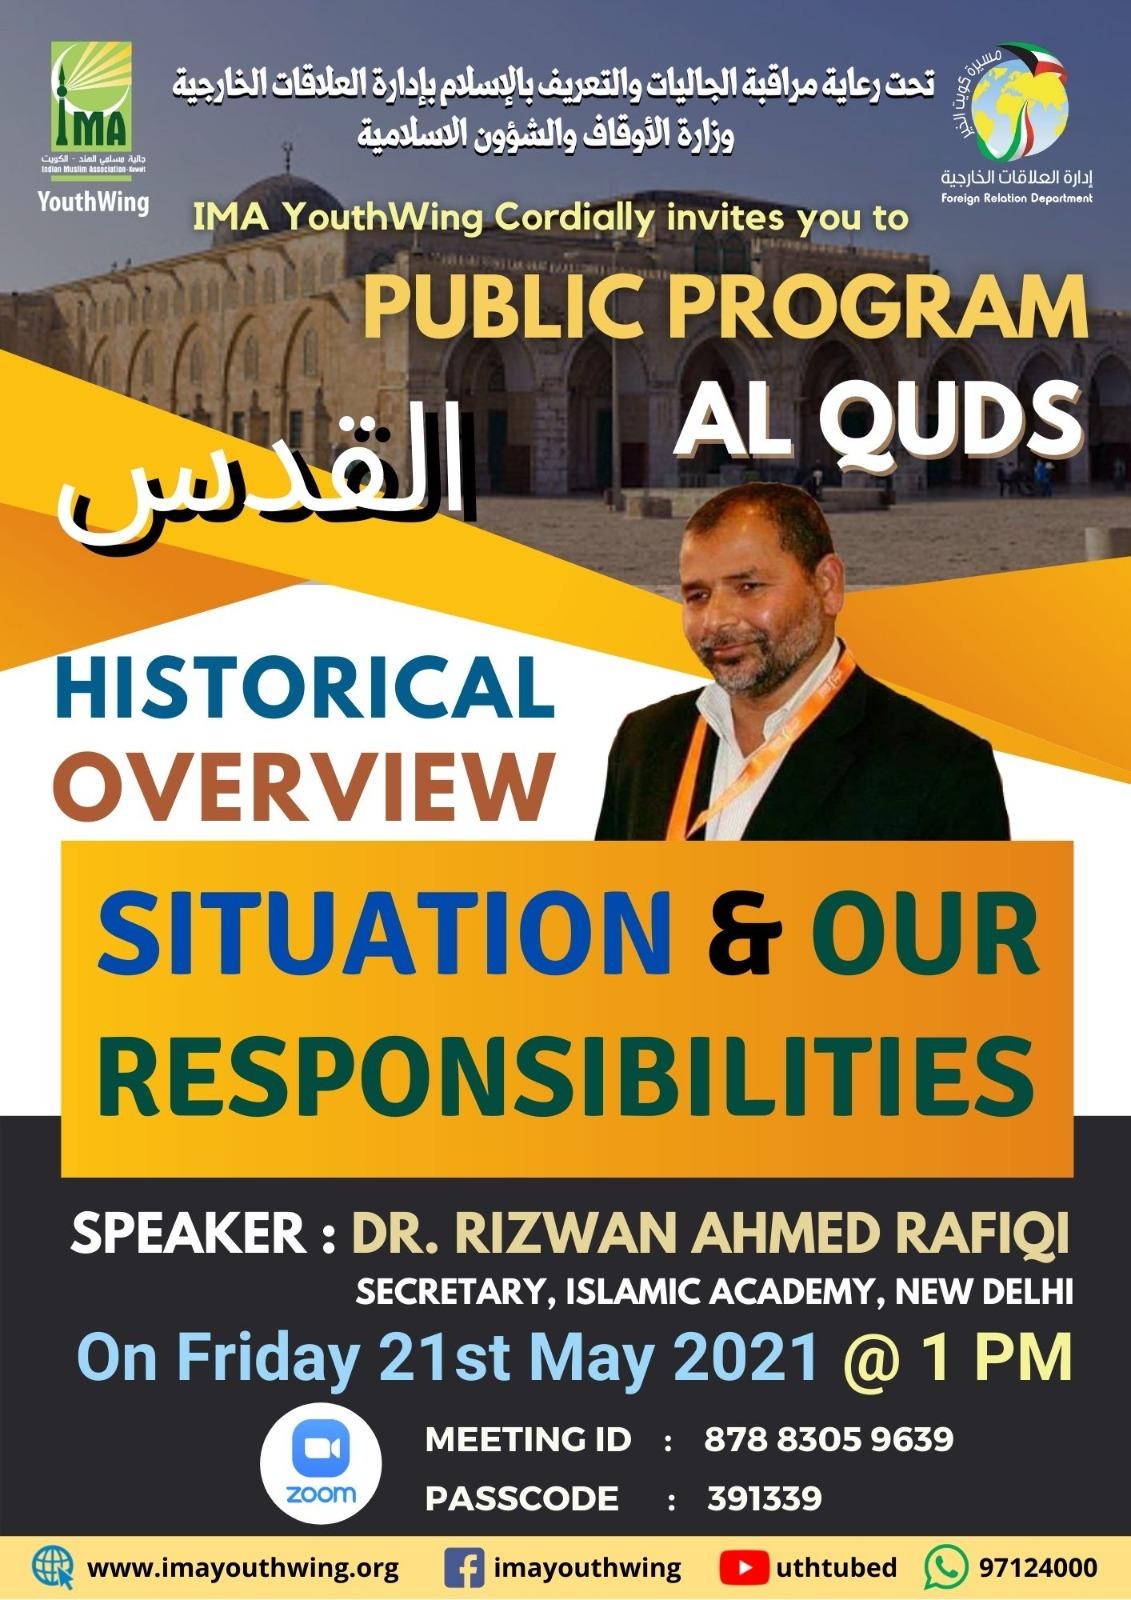 Public Program AL QUDS – HISTORY OVERVIEW, SITUATION & OUR RESPONSIBILITIES